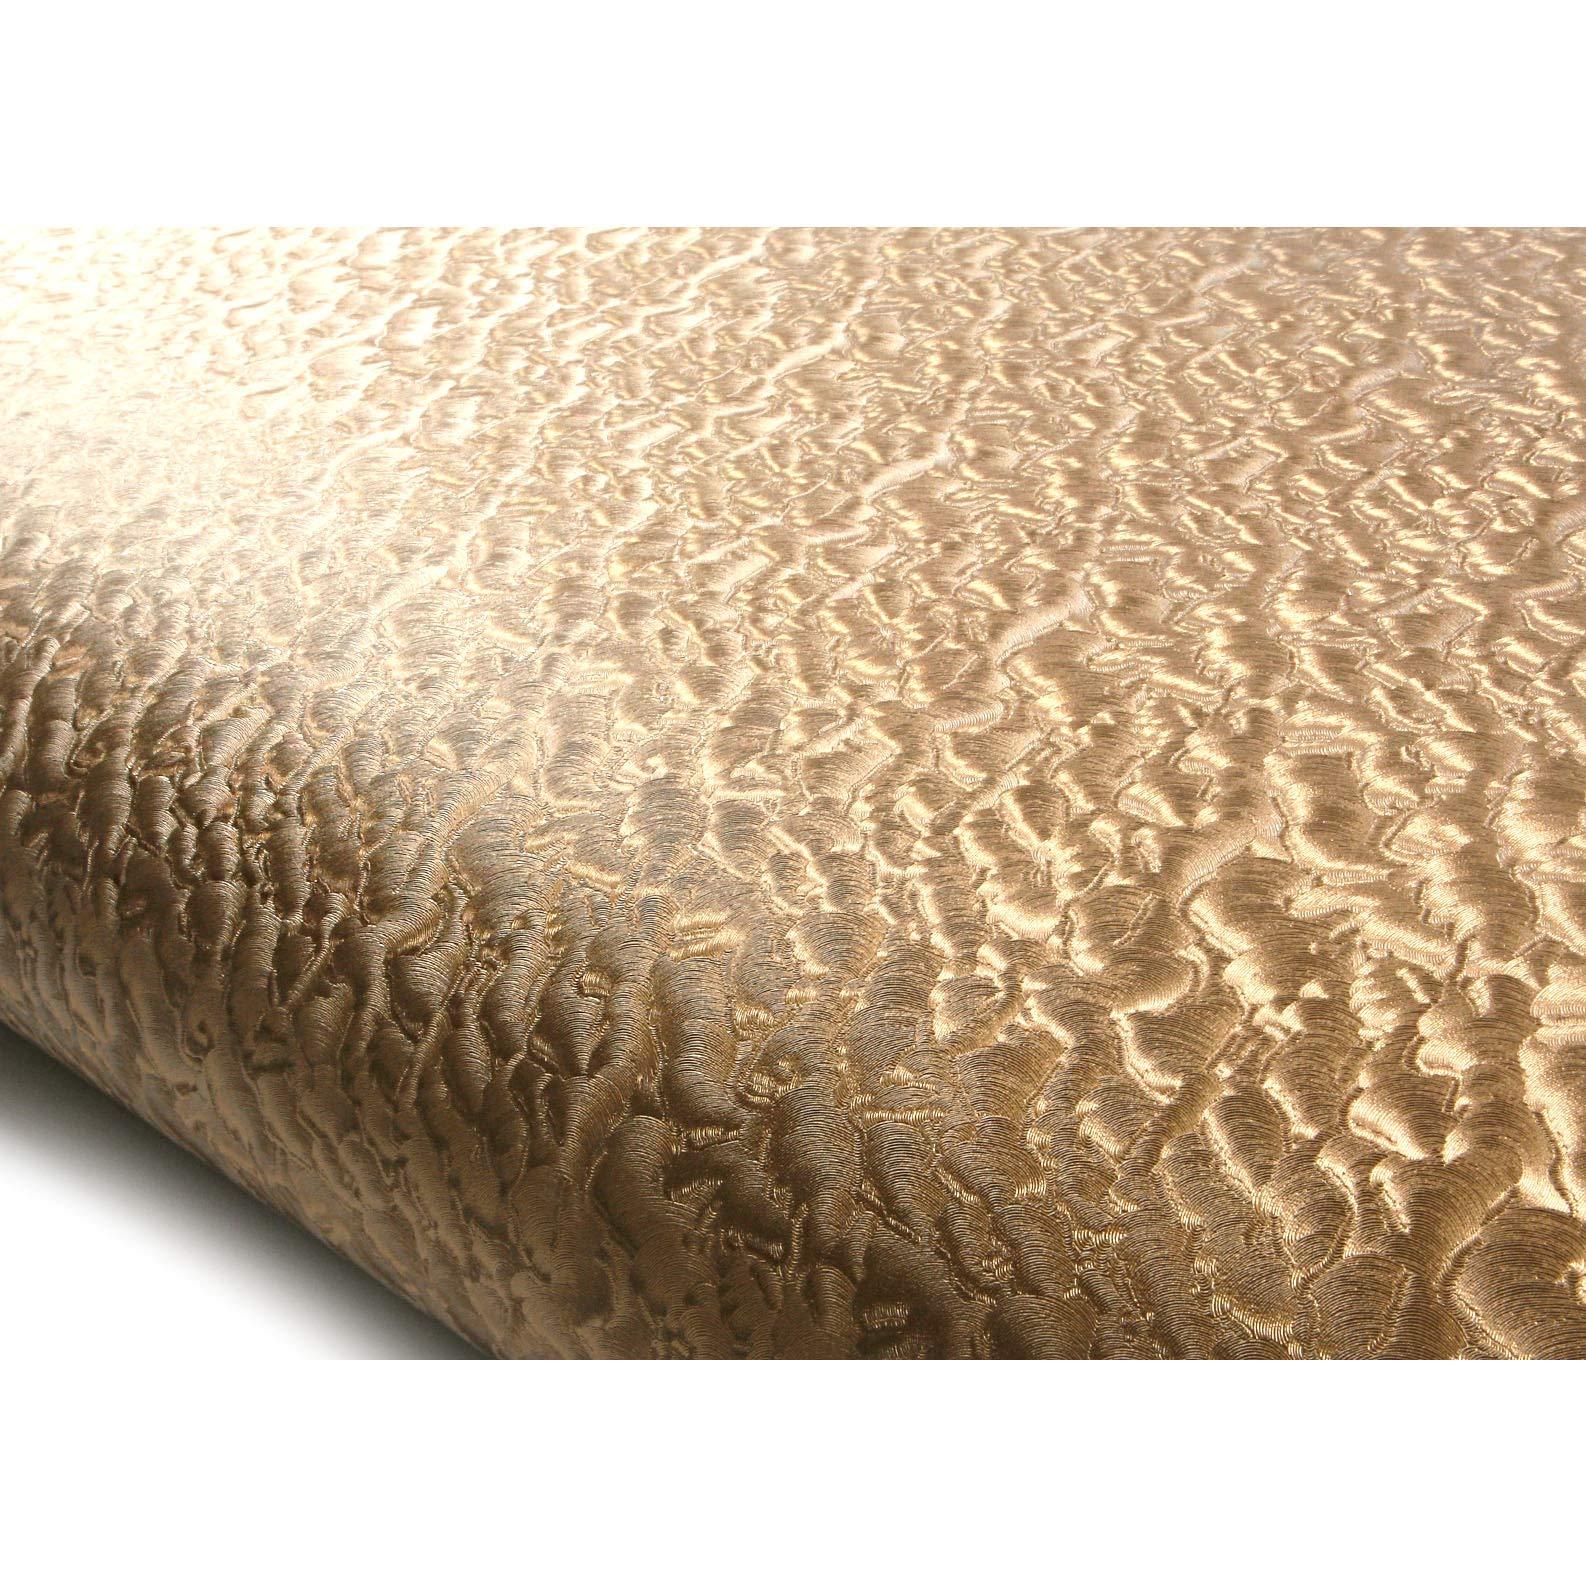 ROSEROSA Peel & Stick Leather Pattern Backsplash Crocodile Tiger Camel Contact Paper Self-adhesive Wallpaper Shelf Liner Table Door Reform (MF5147-9 : 2.00 Feet X 6.56 Feet)